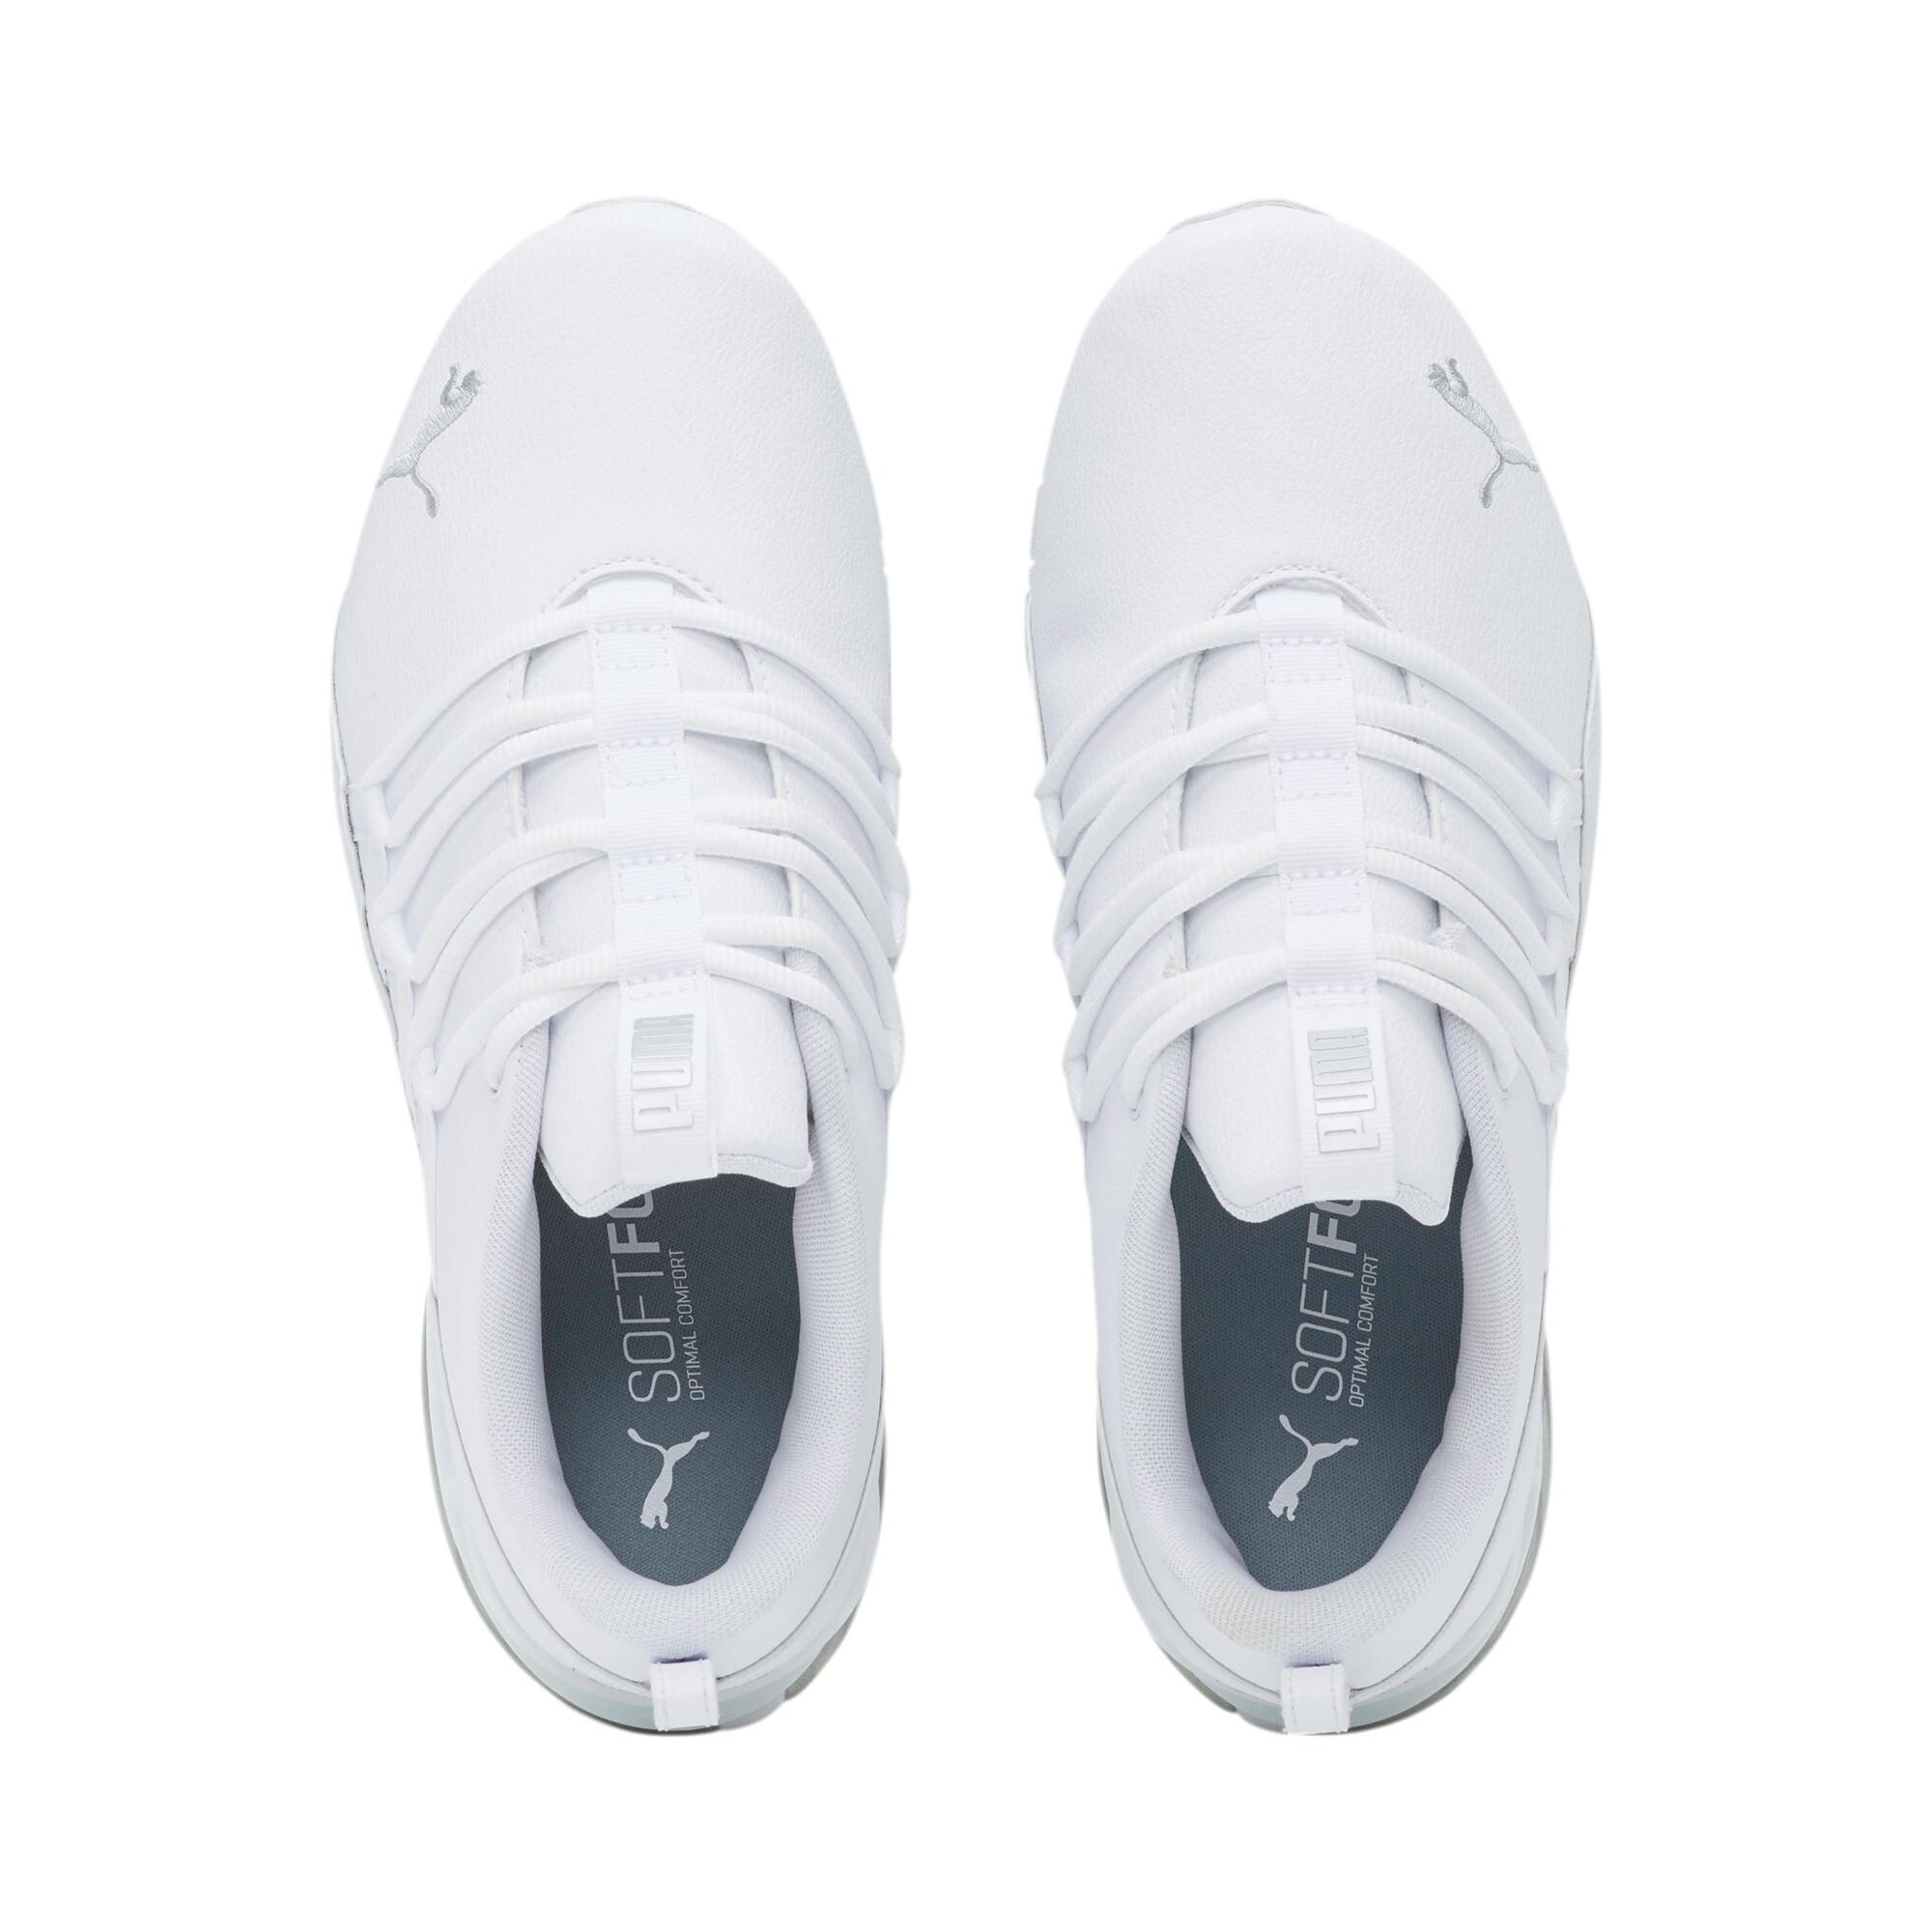 PUMA-Women-039-s-Riaze-Prowl-Wide-Sneakers thumbnail 7